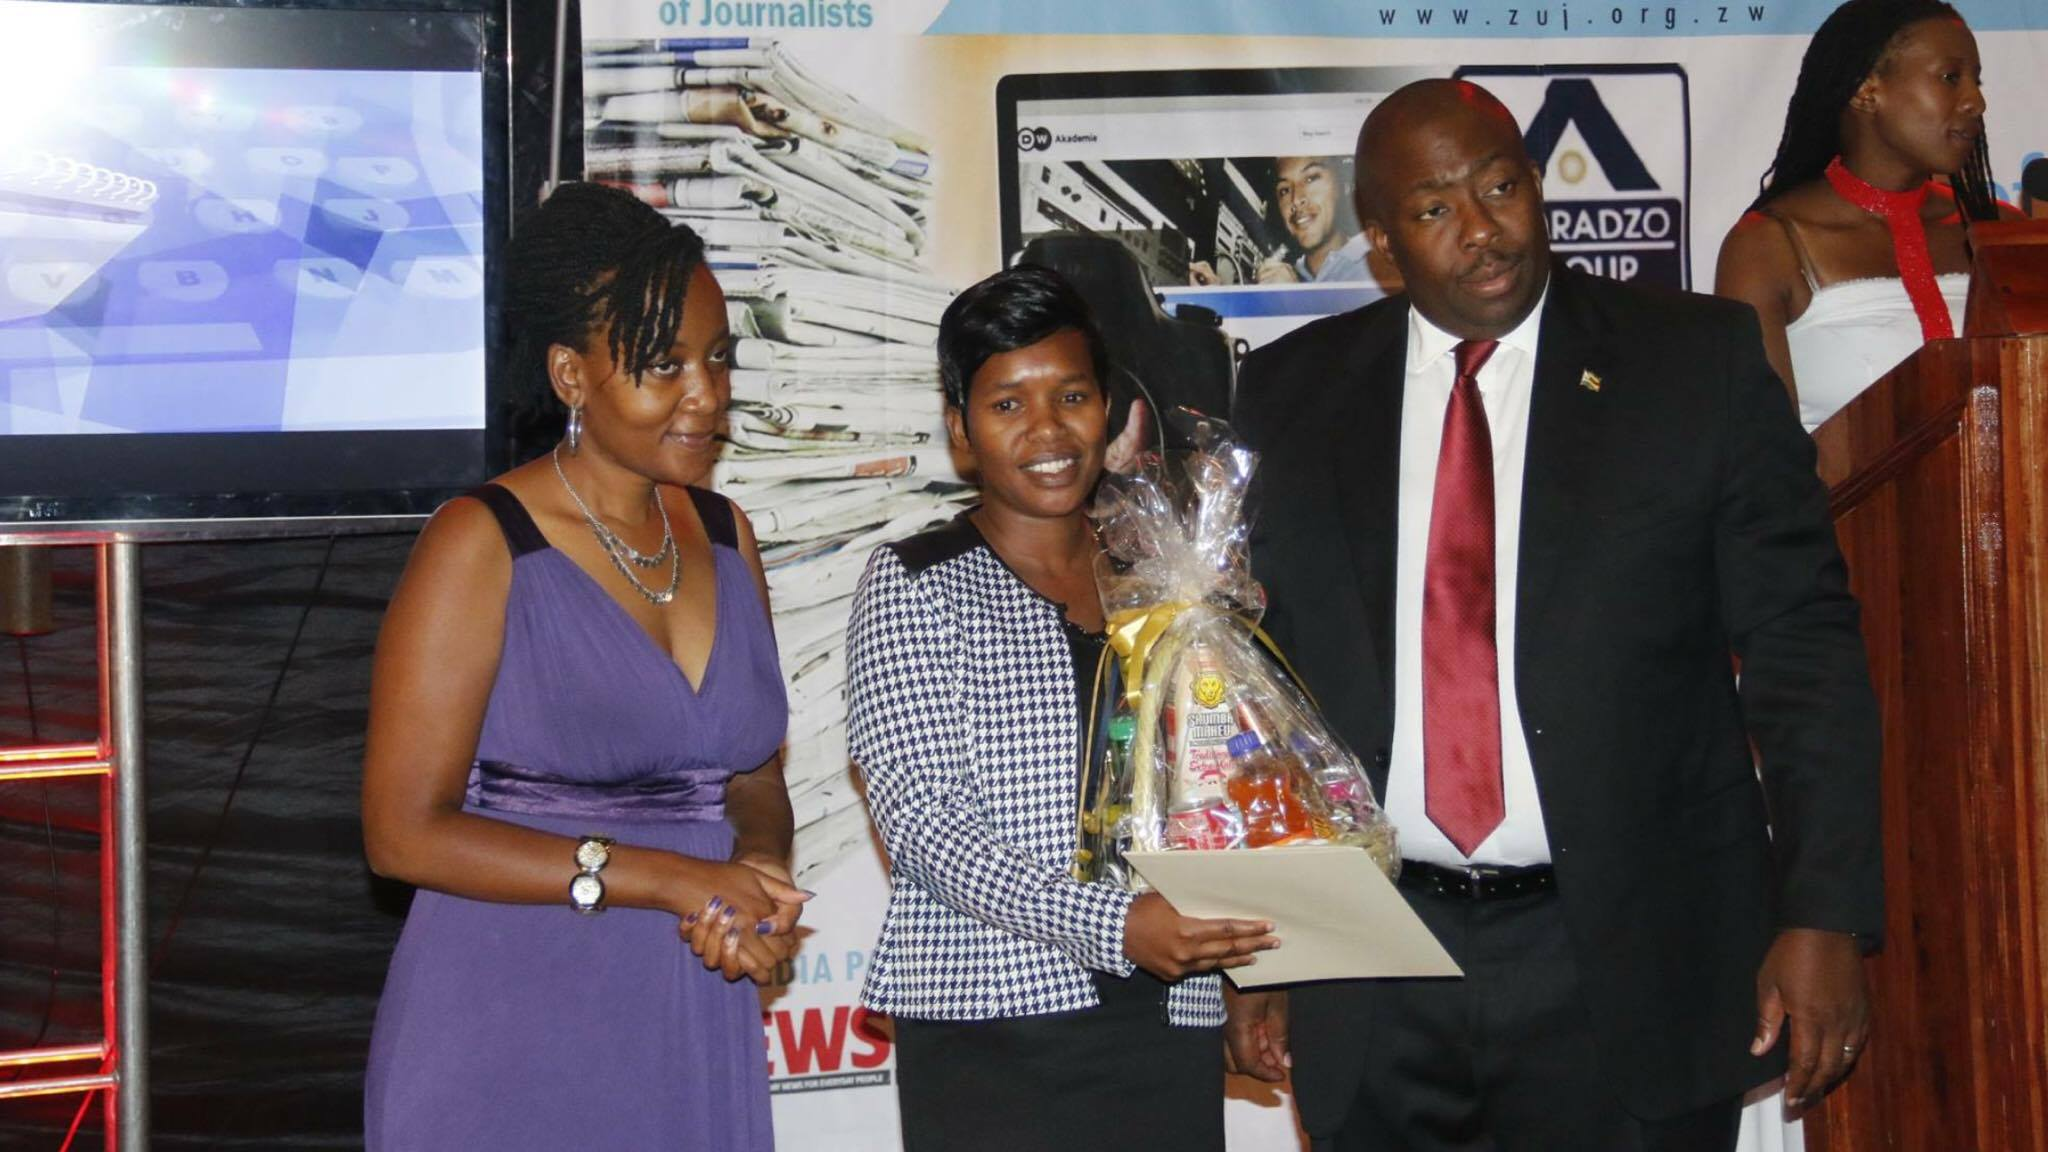 Elizabeth Blessie Mupfumira been photographed in the company of Saviour Kasukuwere, the Zanu PF national commissar.